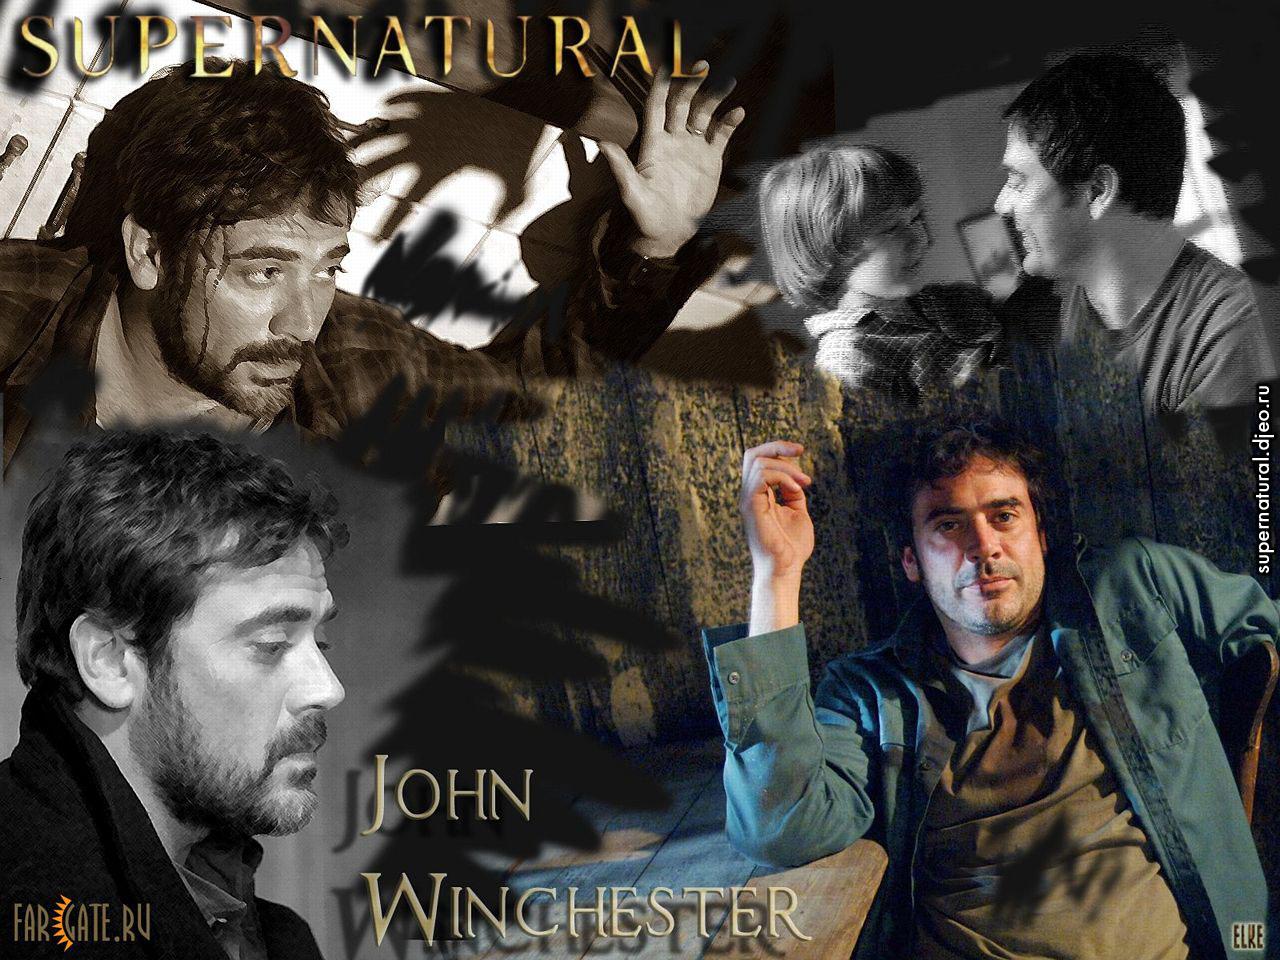 http://supernatural.djeo.ru/images_large/wallpapers/pic029.jpg